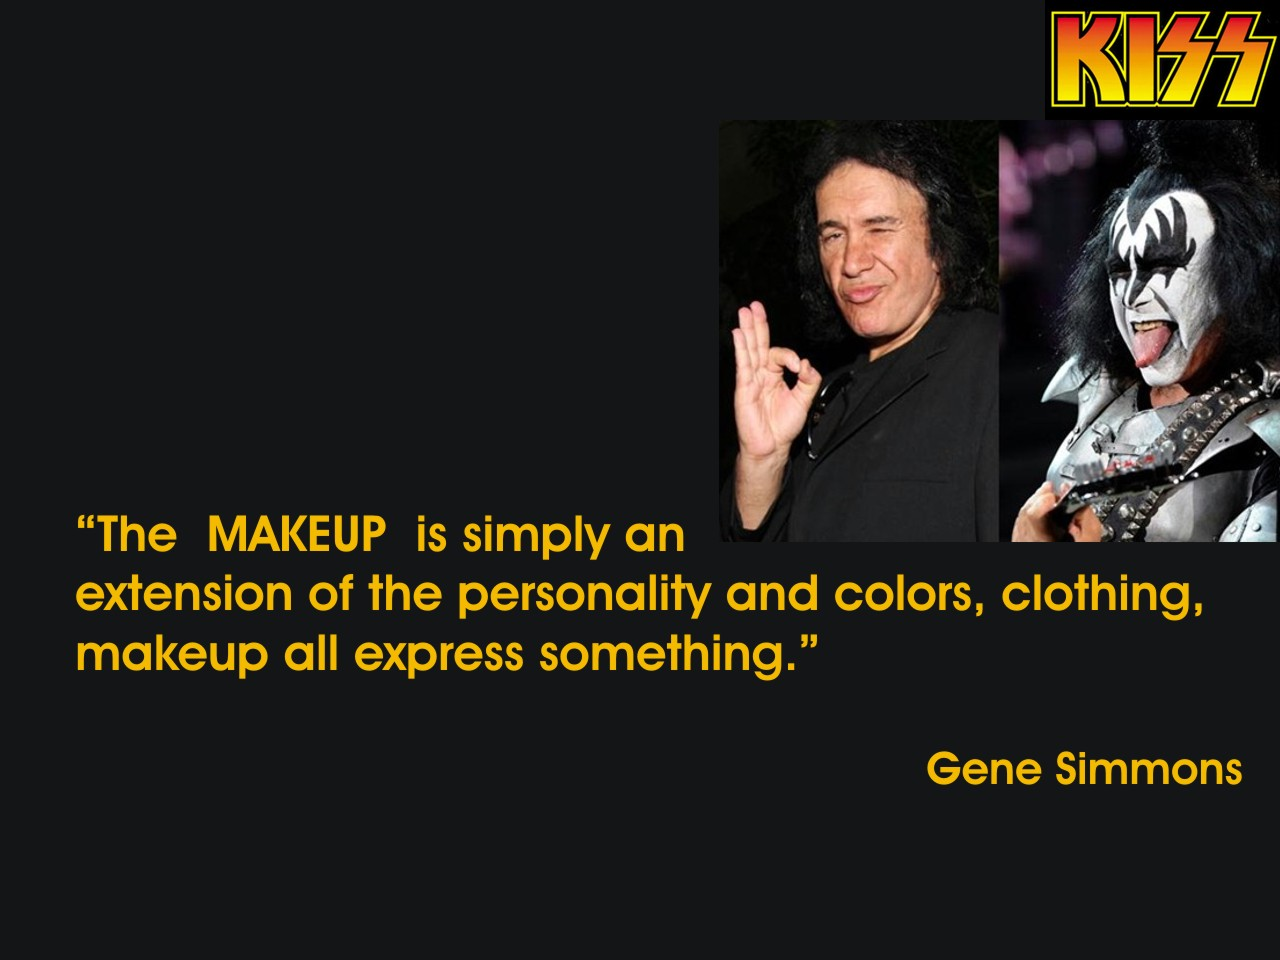 Gene Simmons's quote